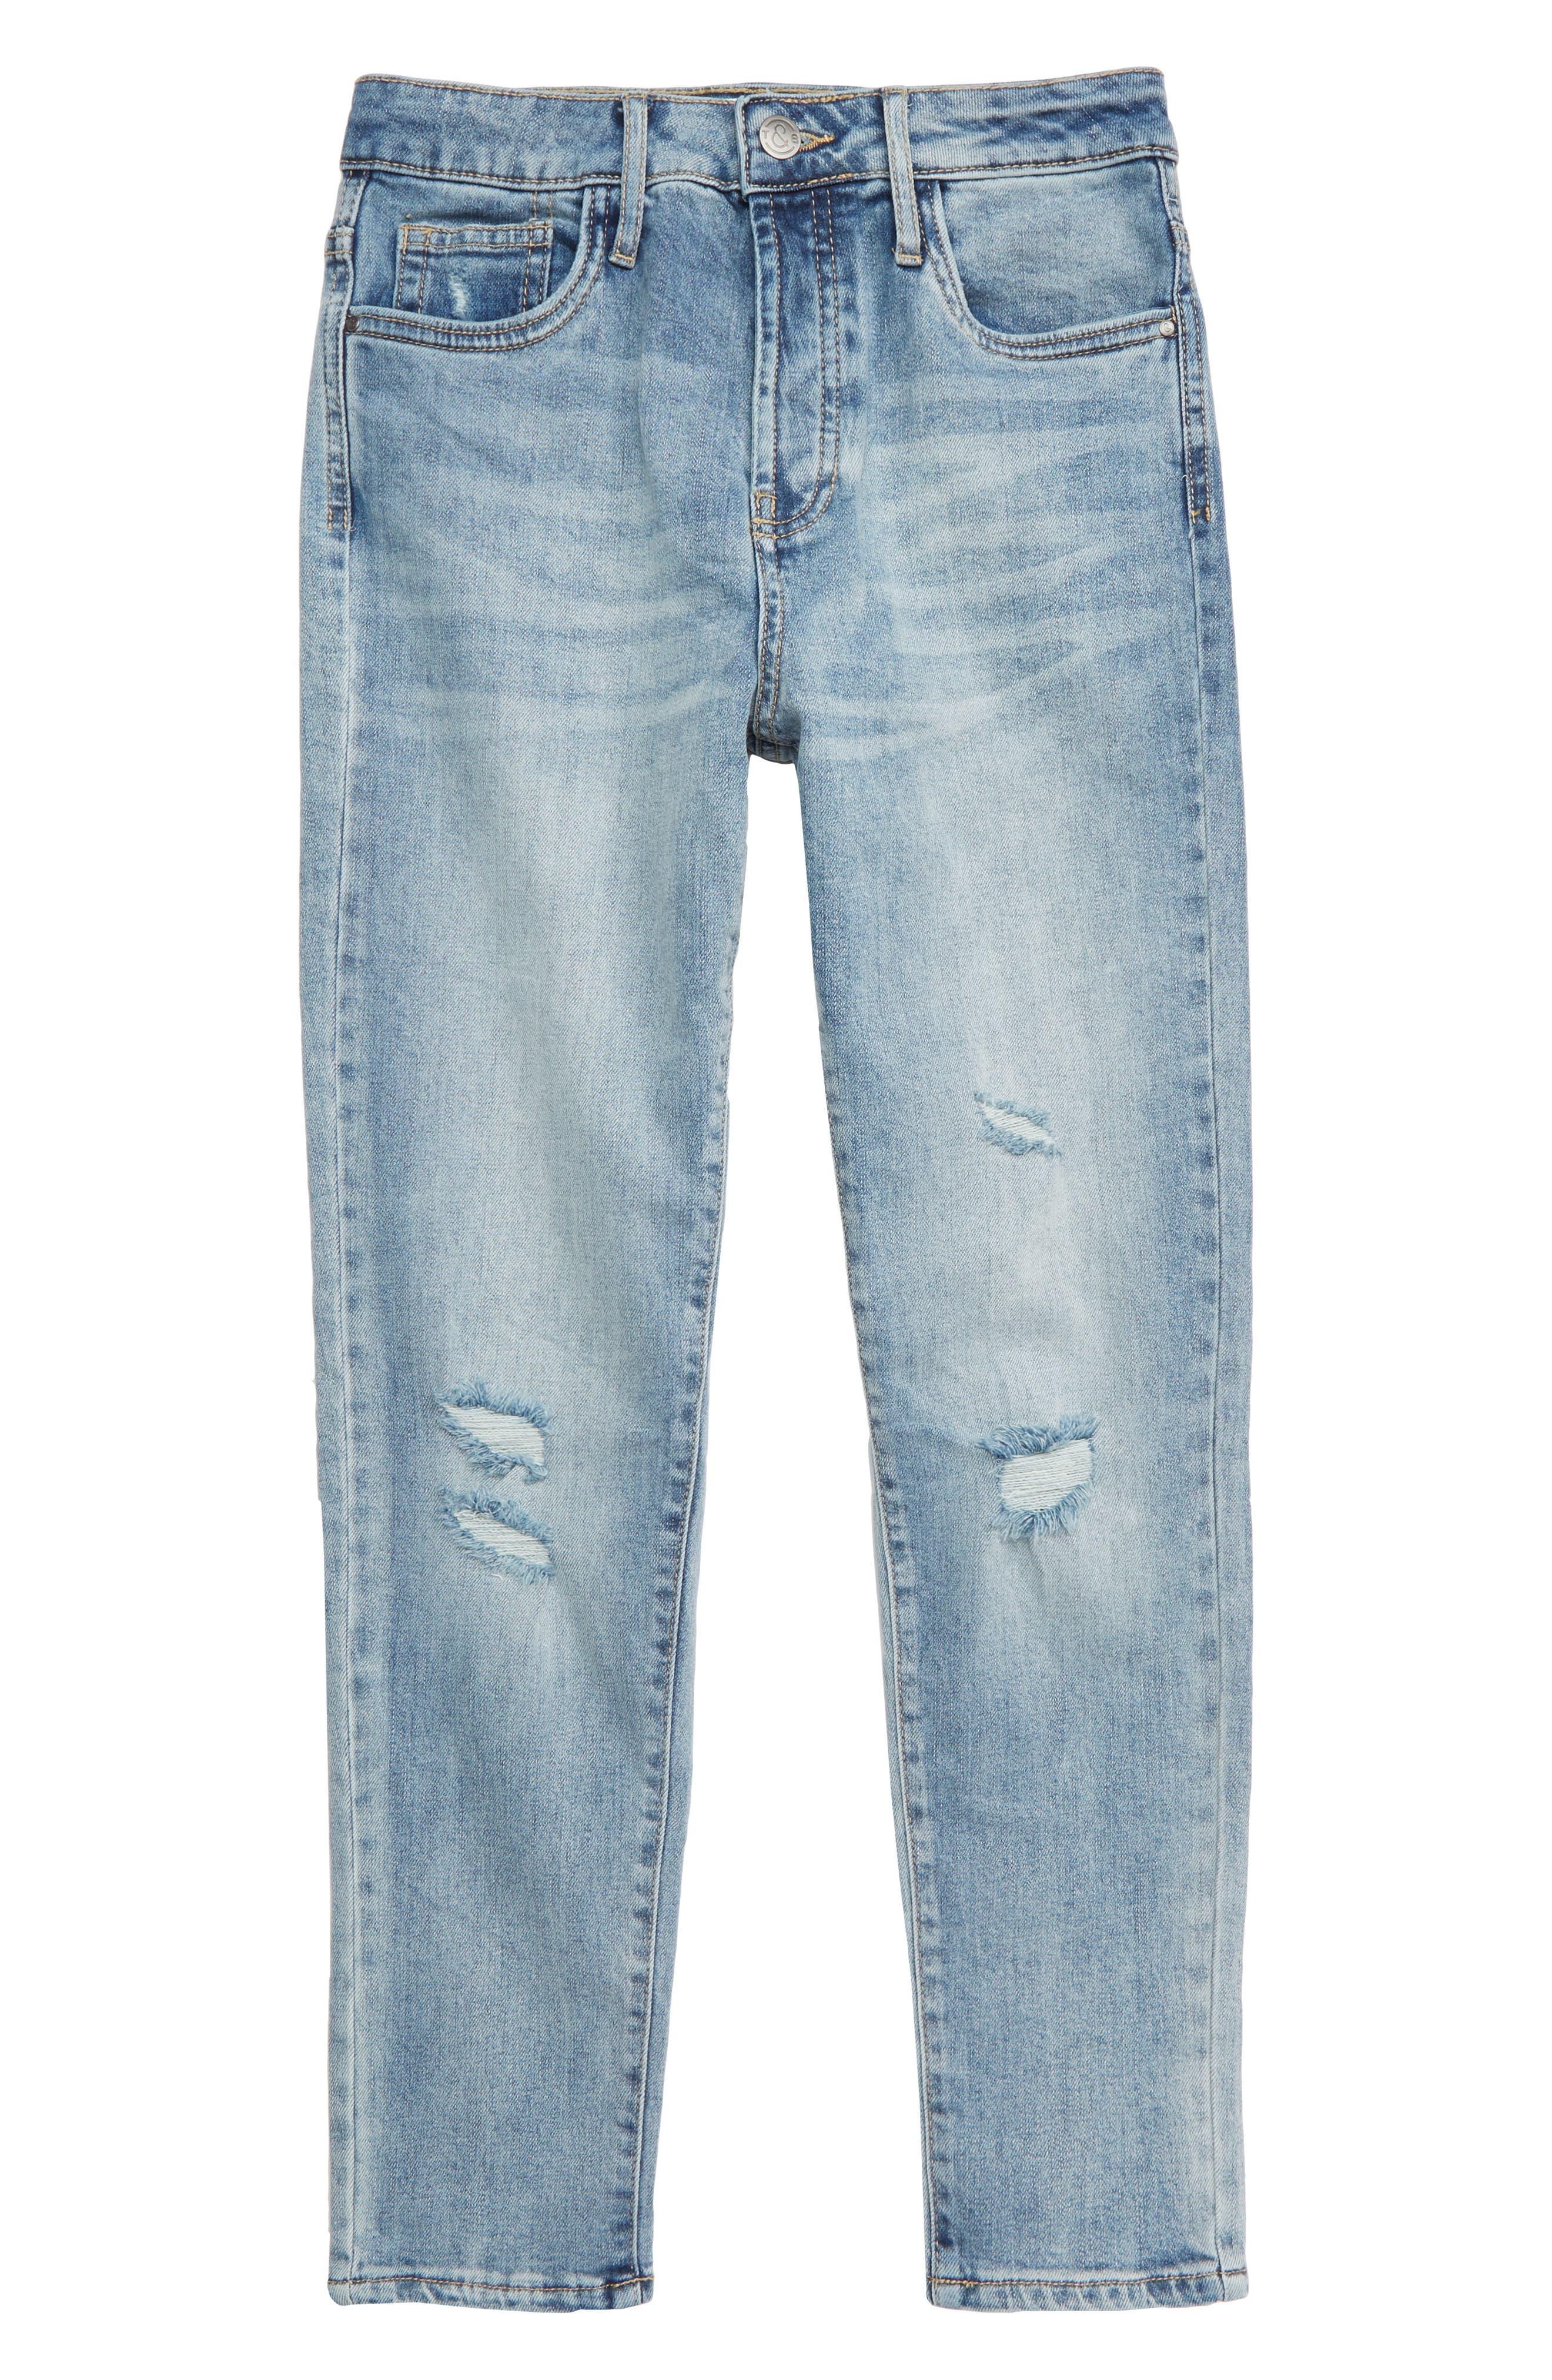 TREASURE & BOND High Waist Distressed Skinny Jeans, Main, color, VINTAGE LIGHT WASH